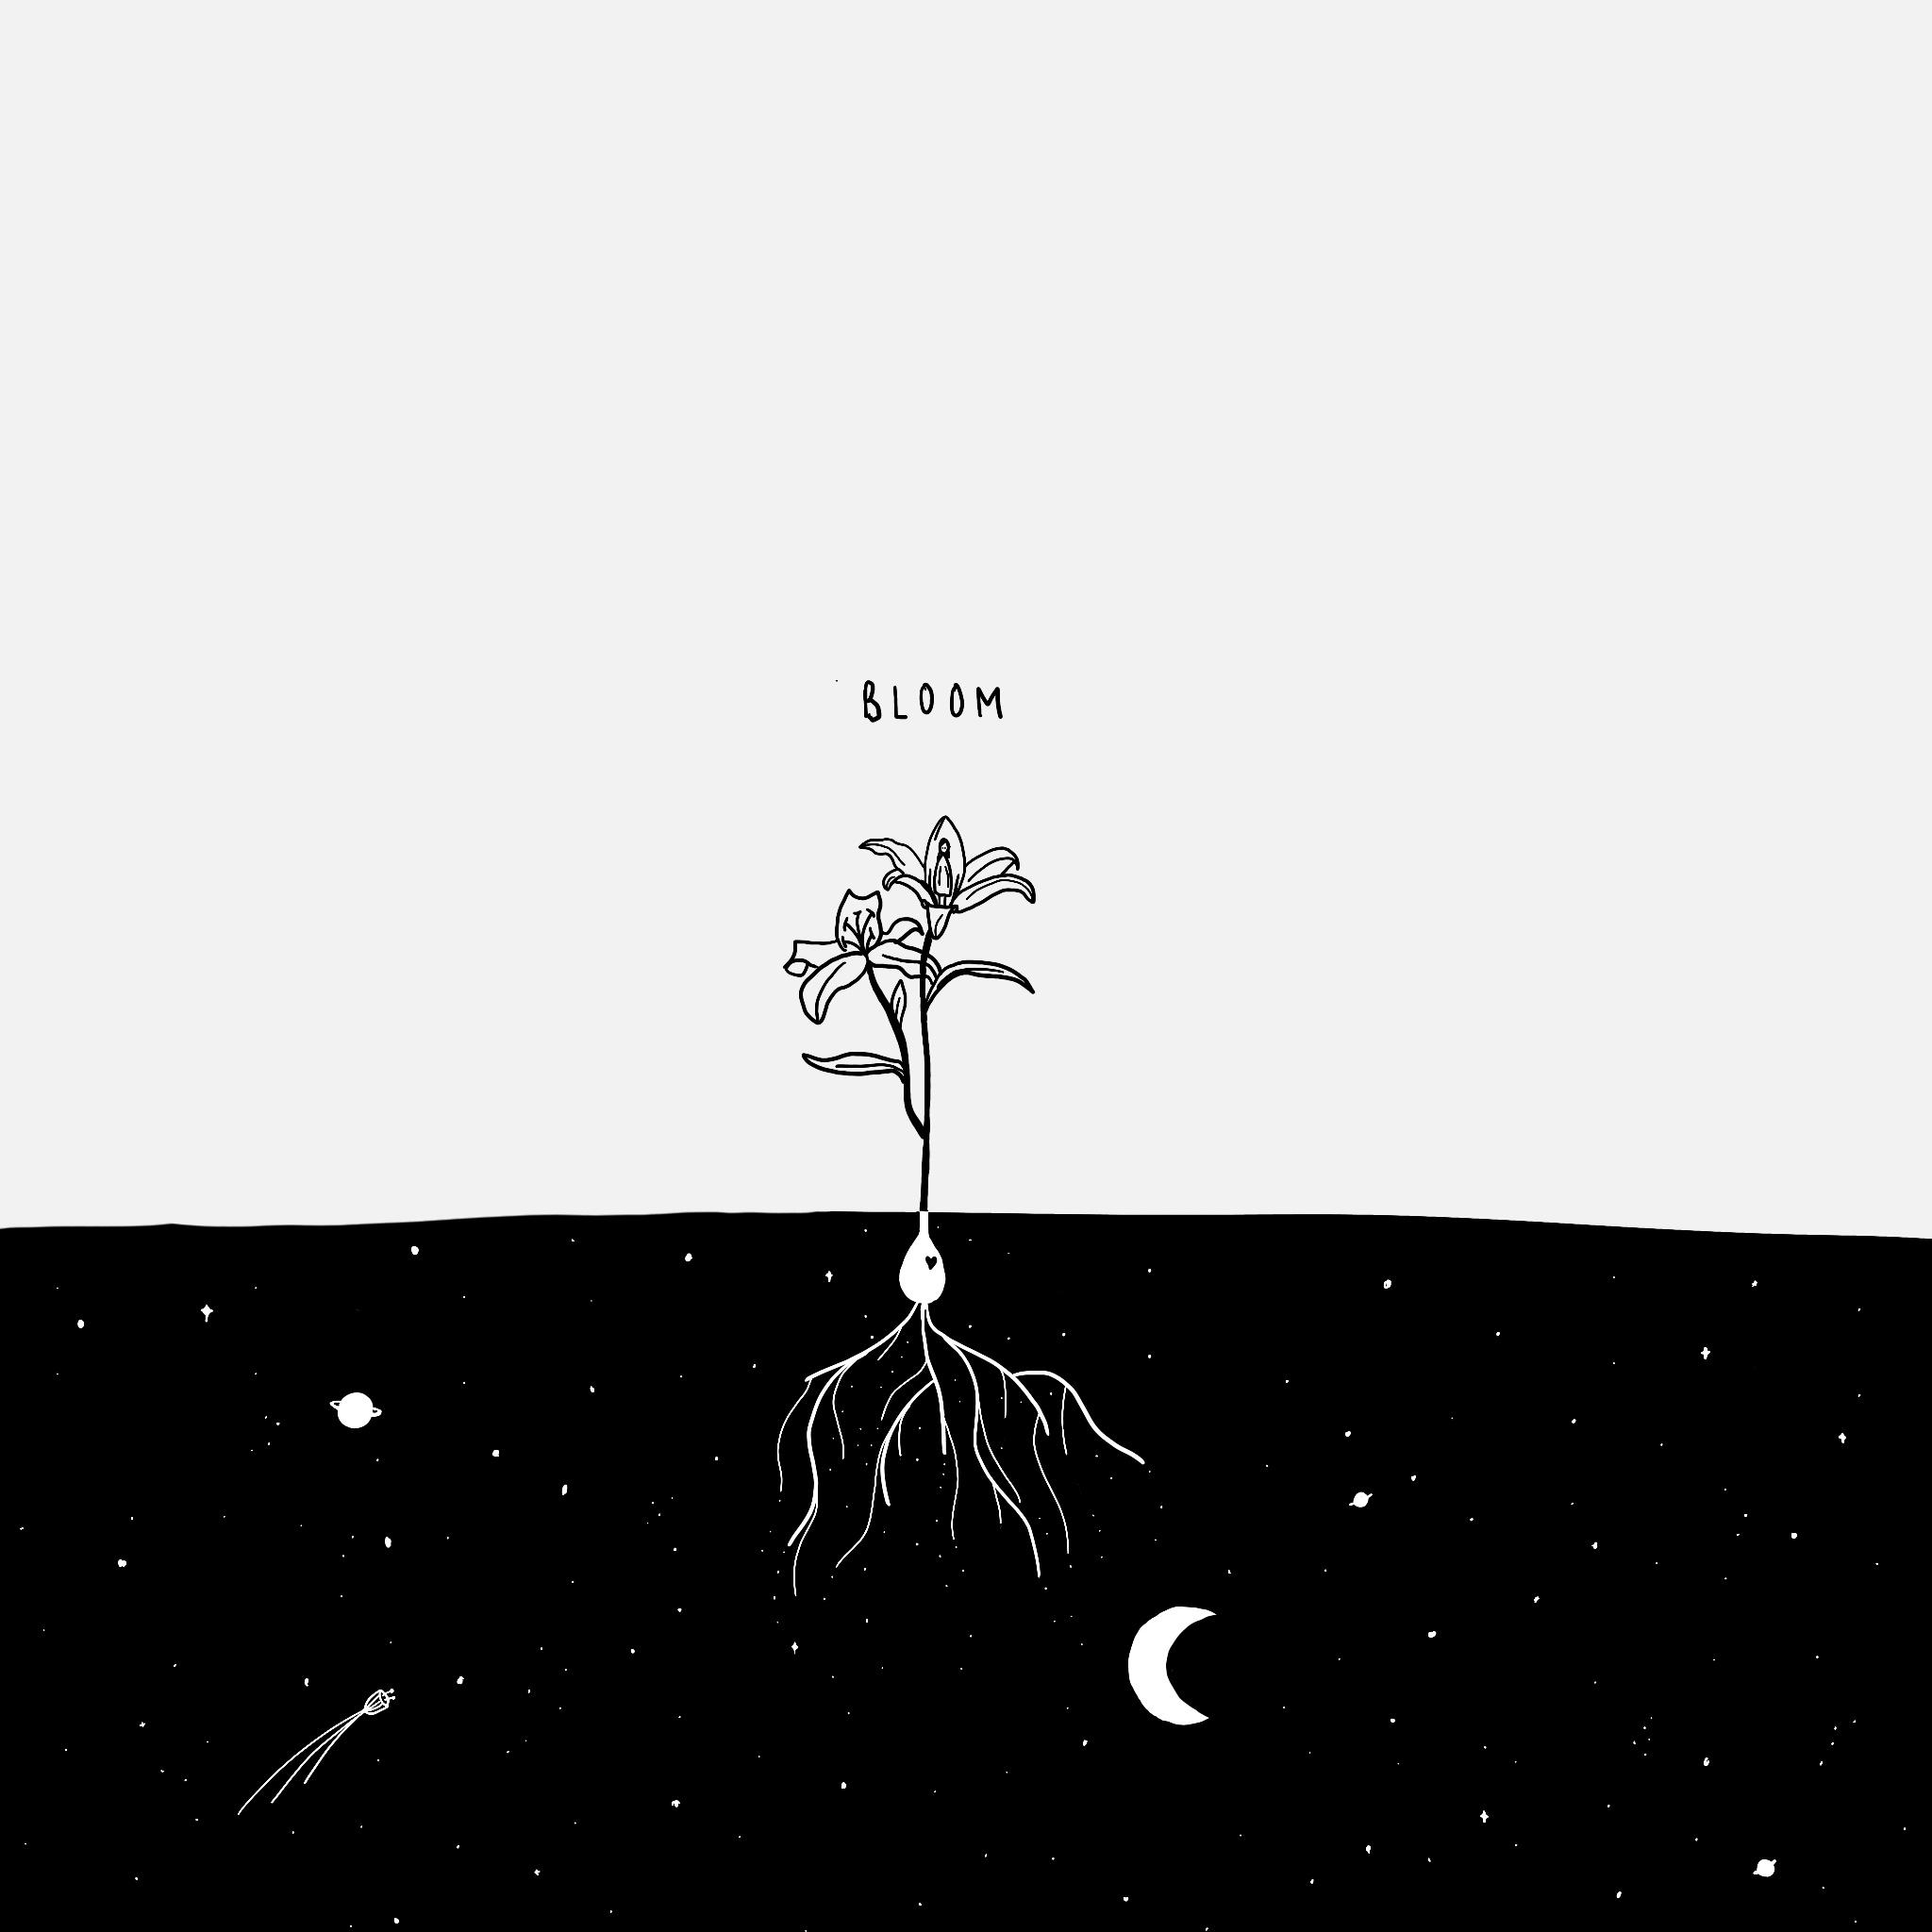 Bloom Illustration